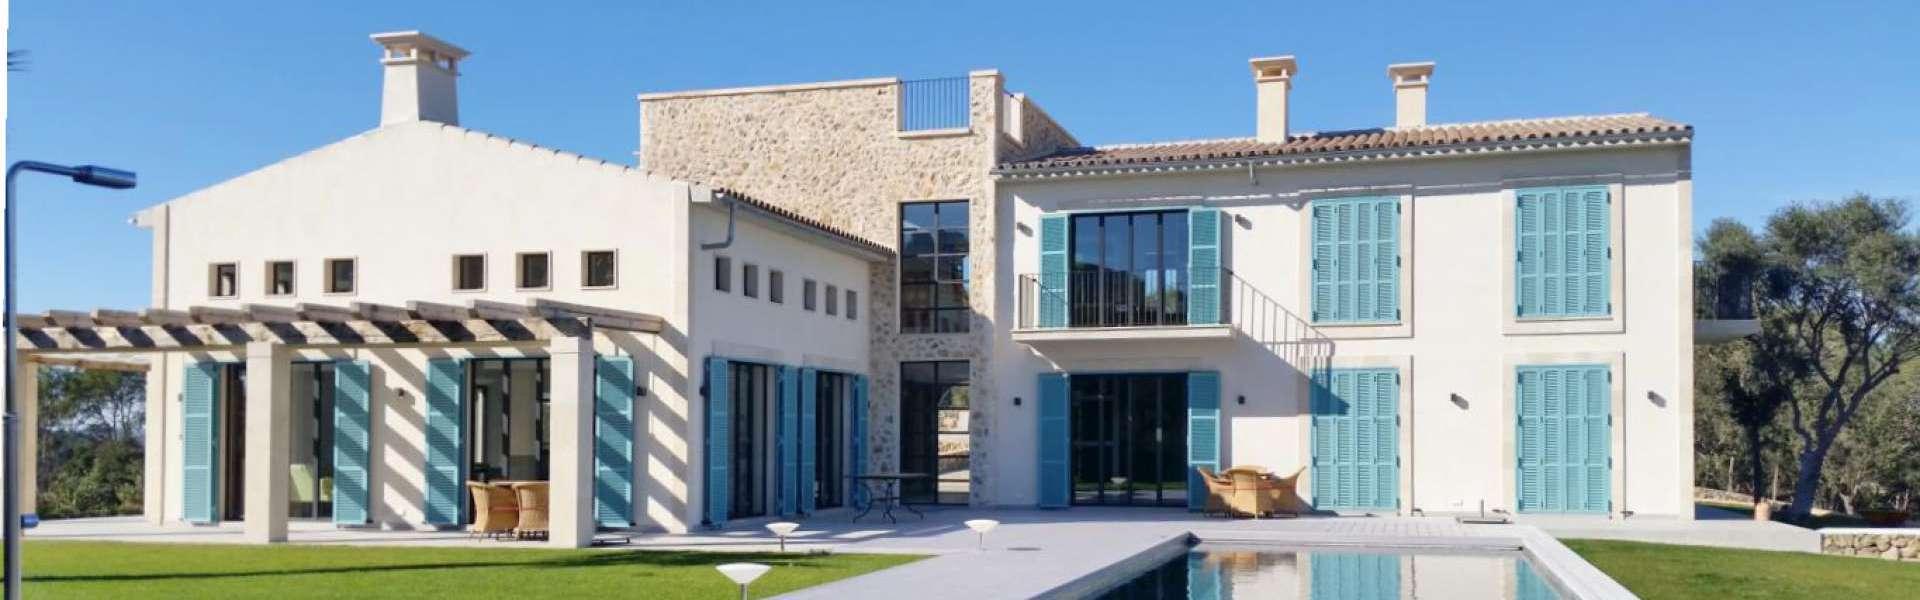 Spacious estate in Felanitx